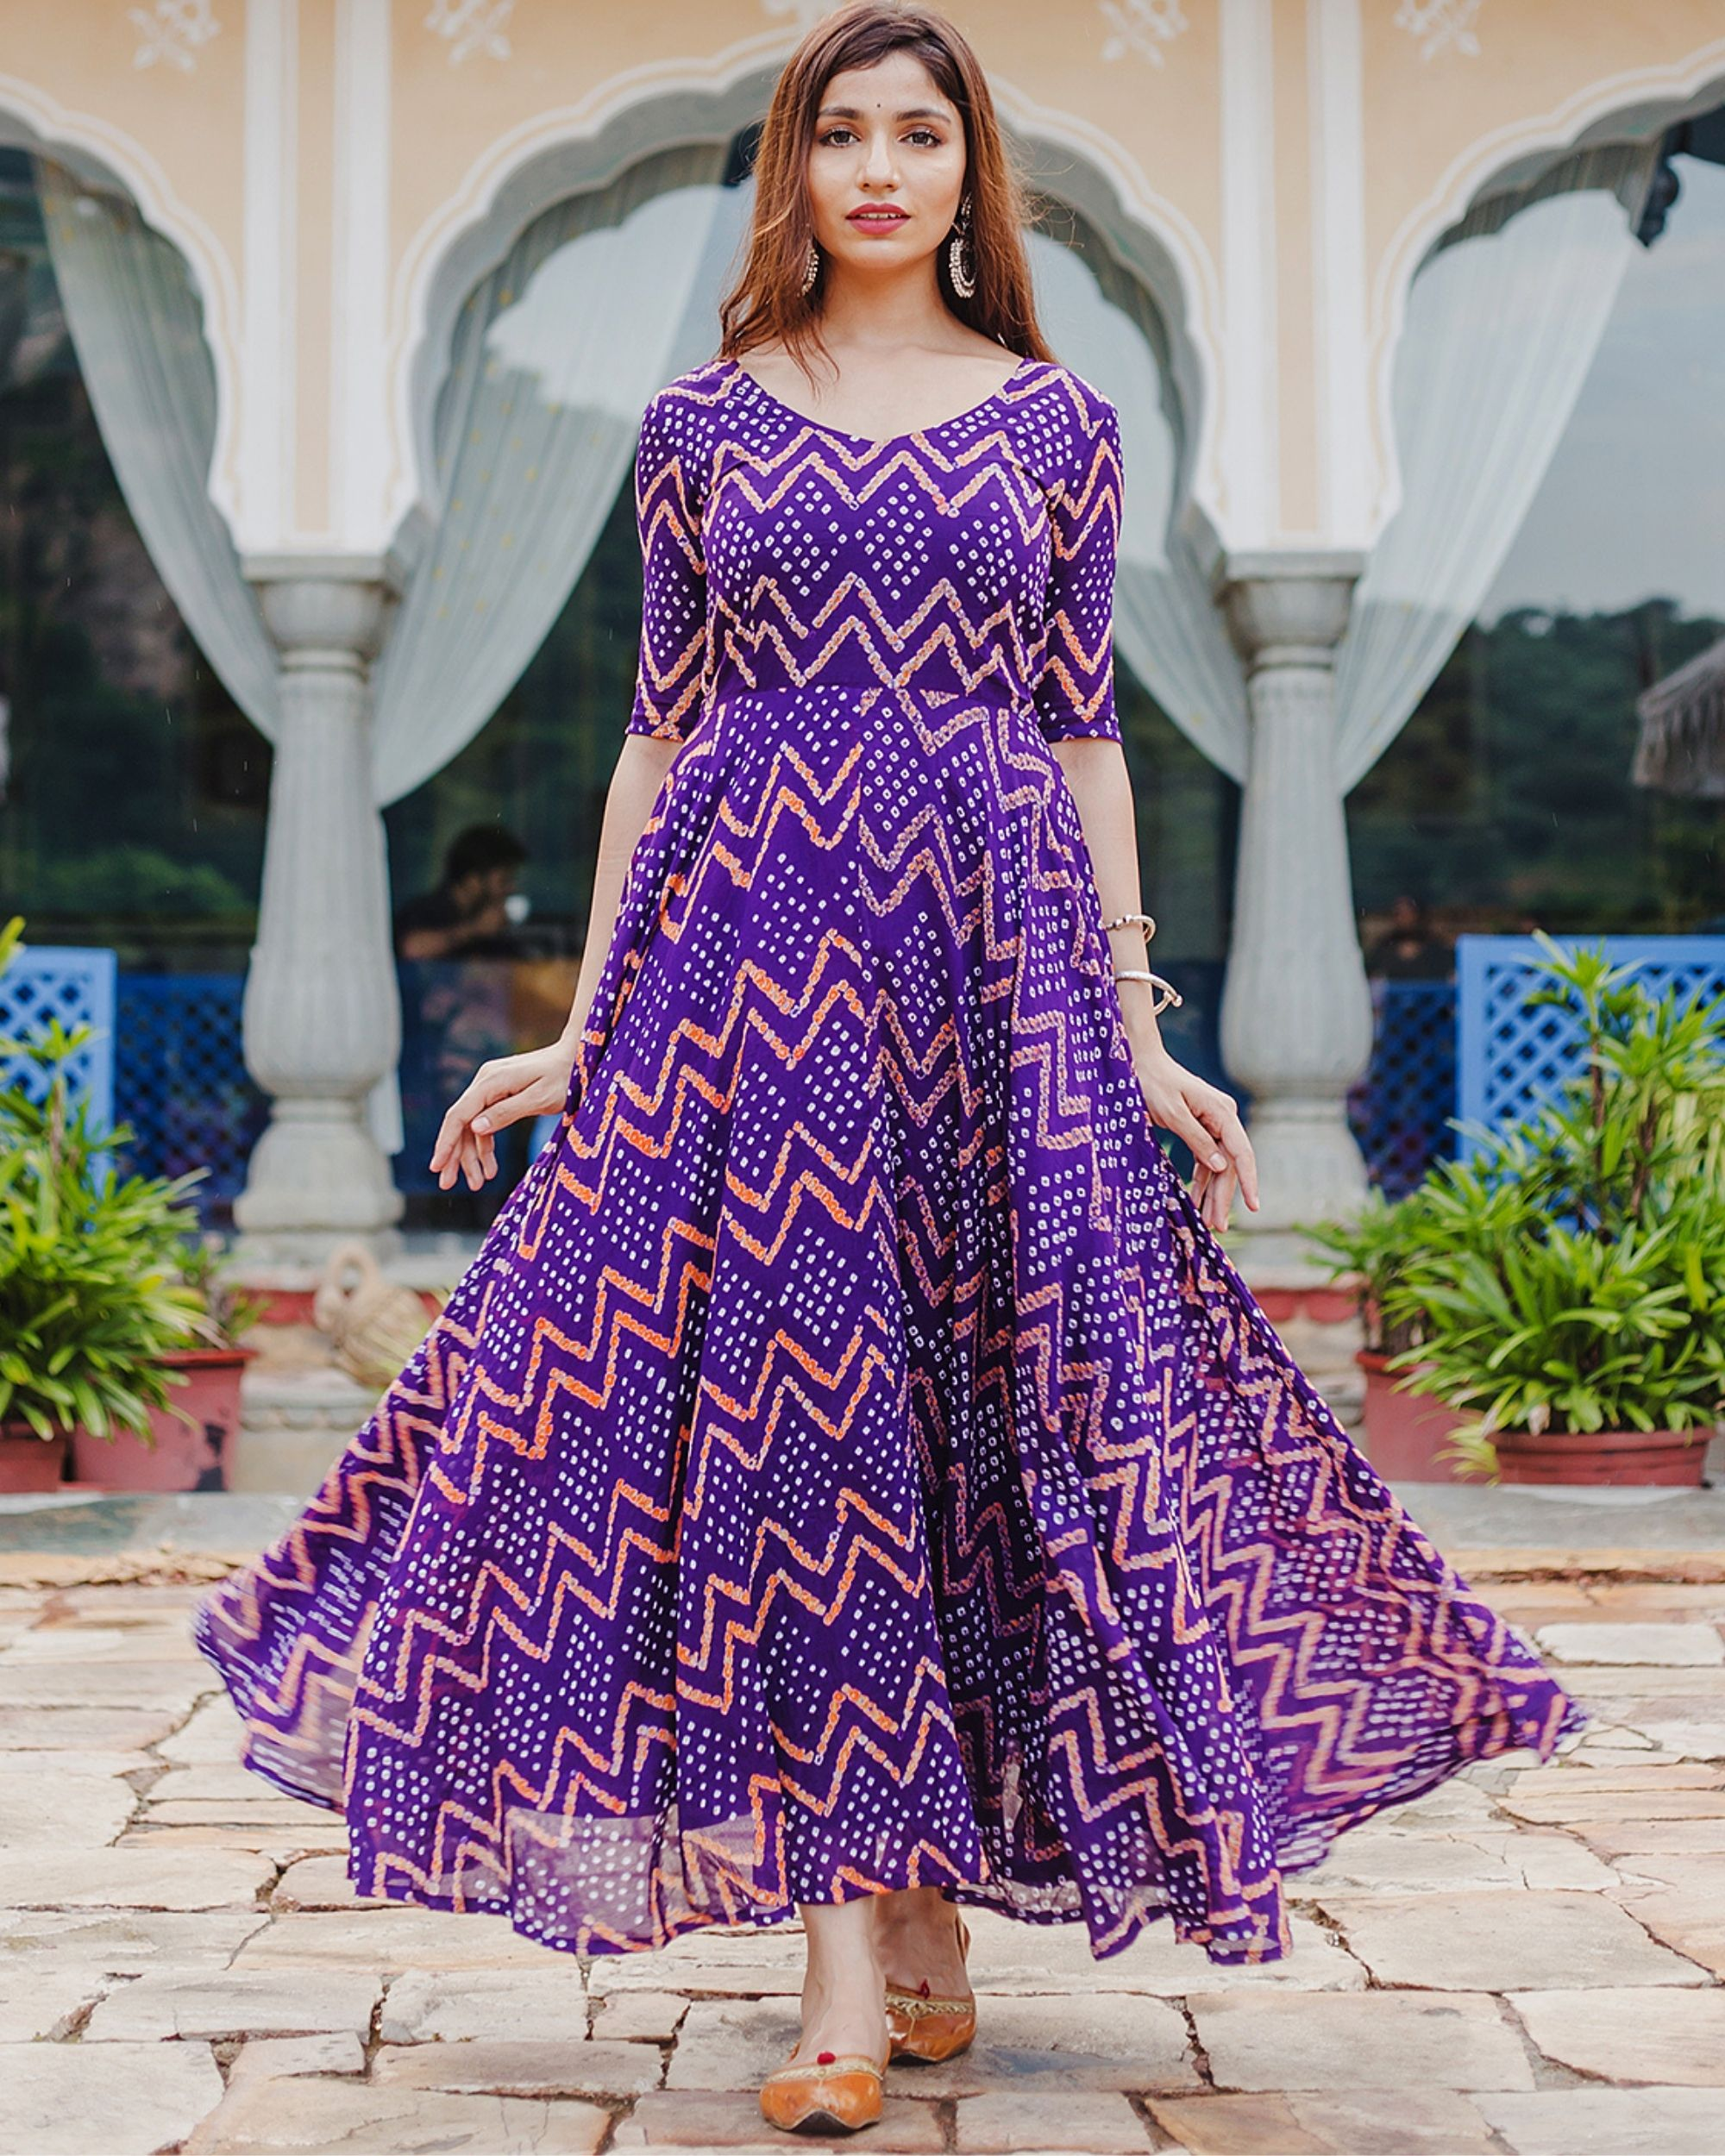 Violet bandhani dress